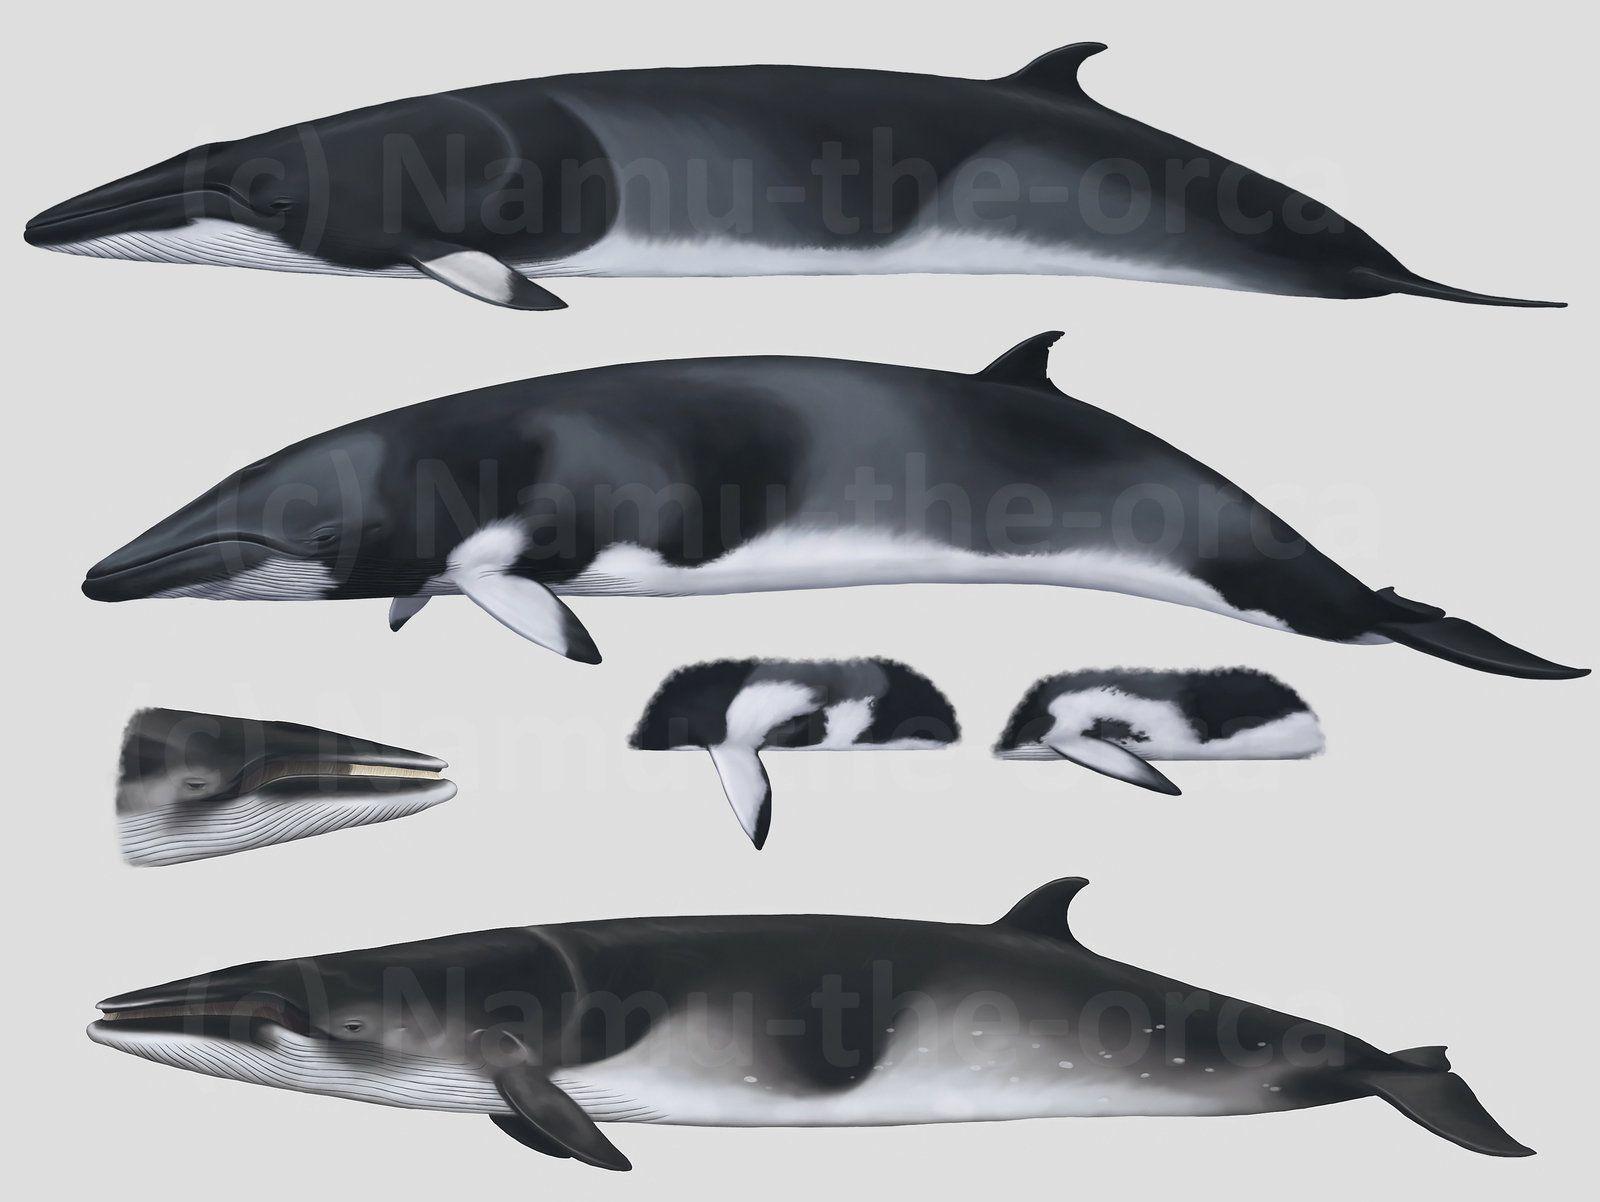 CETACEANS 3 - Minke whales by namu-the-orca on DeviantArt